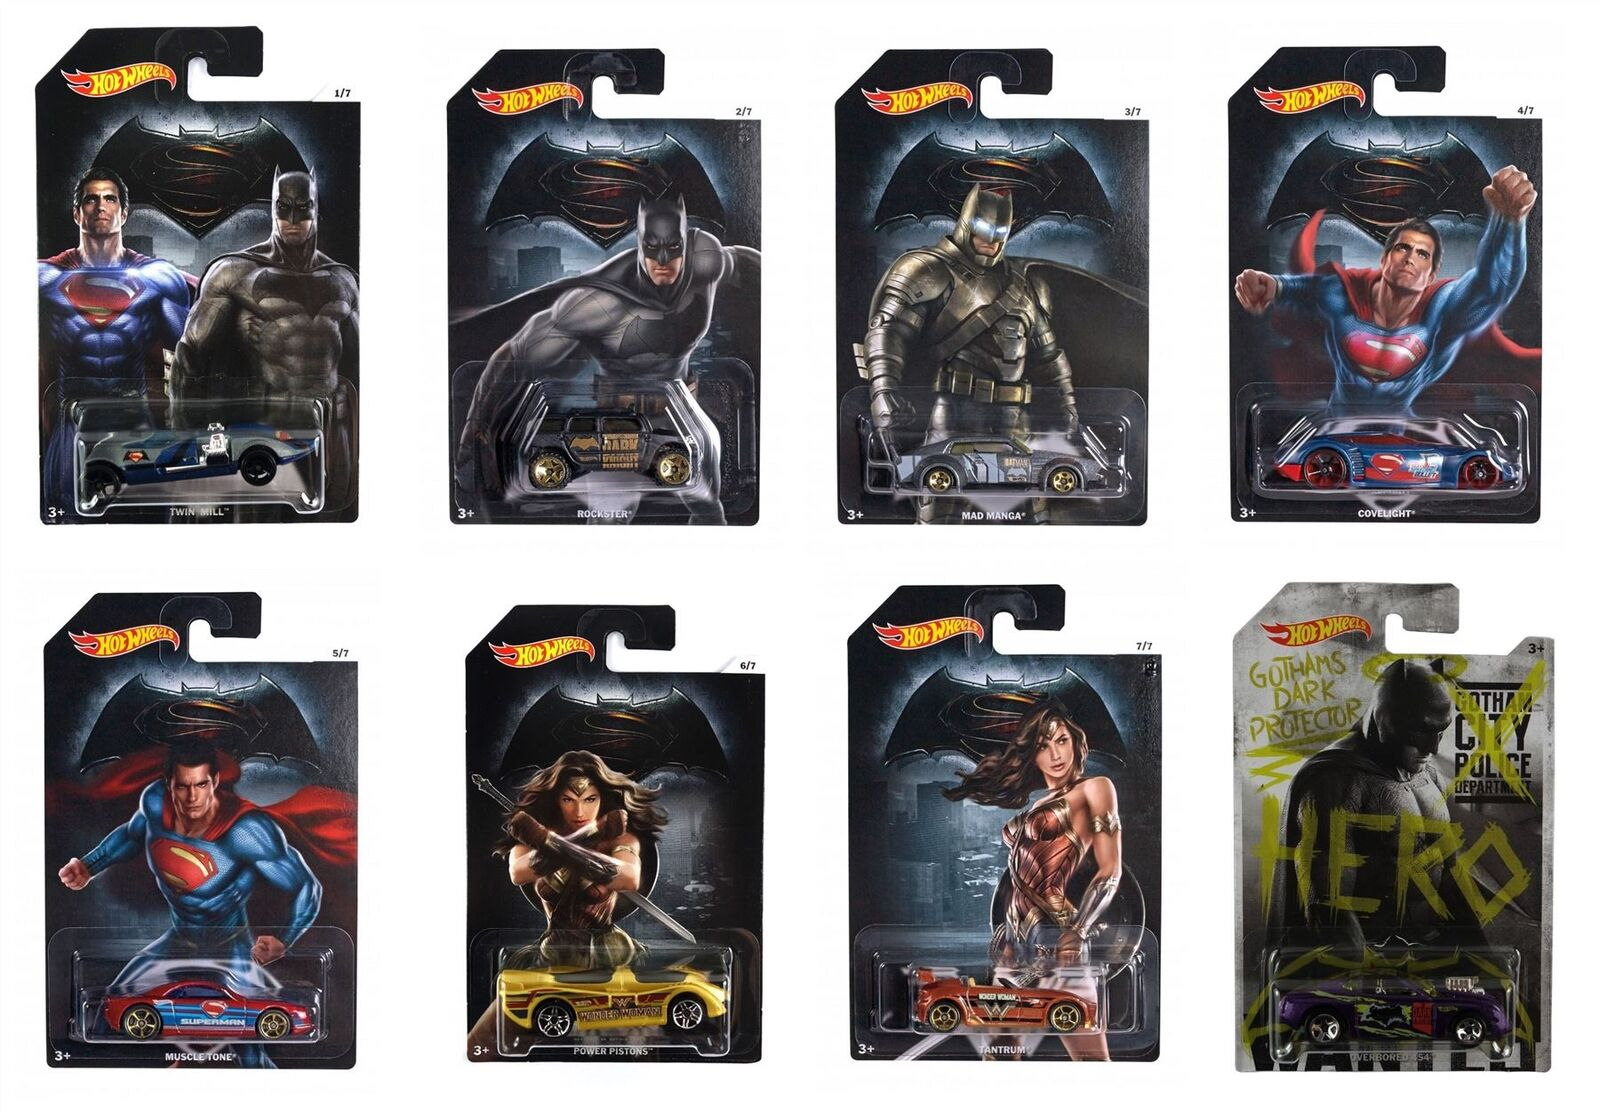 Hot Wheels Batman vs súperman - Completo Conjunto de 8 Coches - DJL47- Modelo